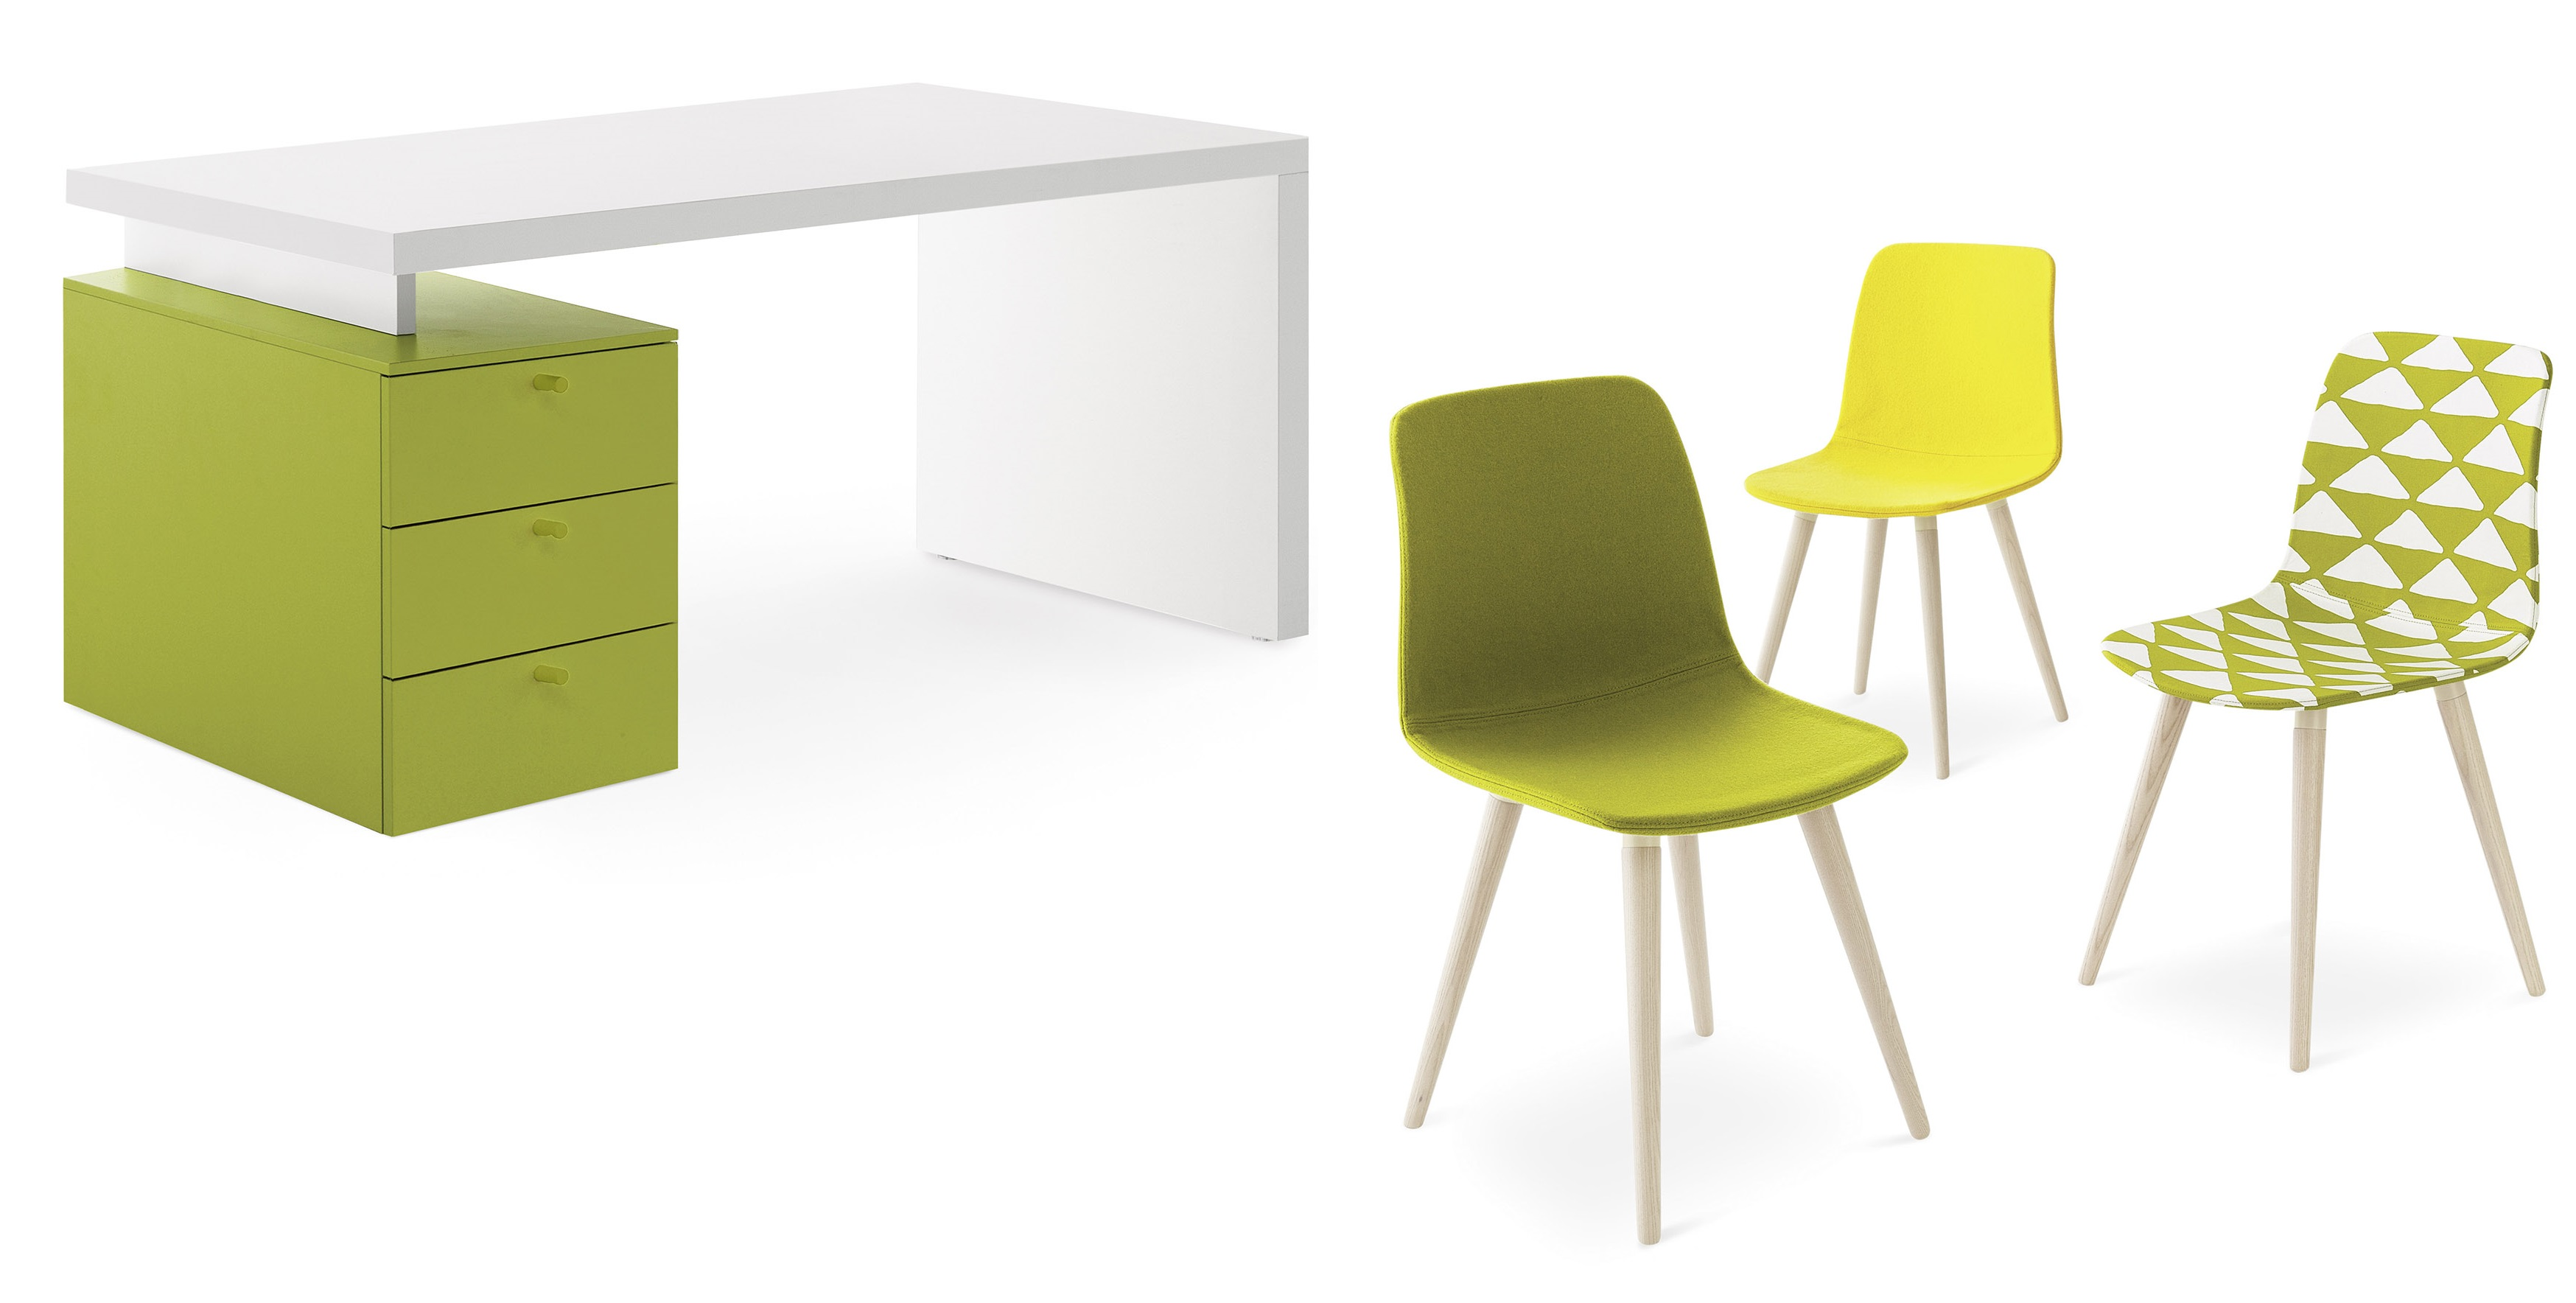 Stoly, židle Nidi